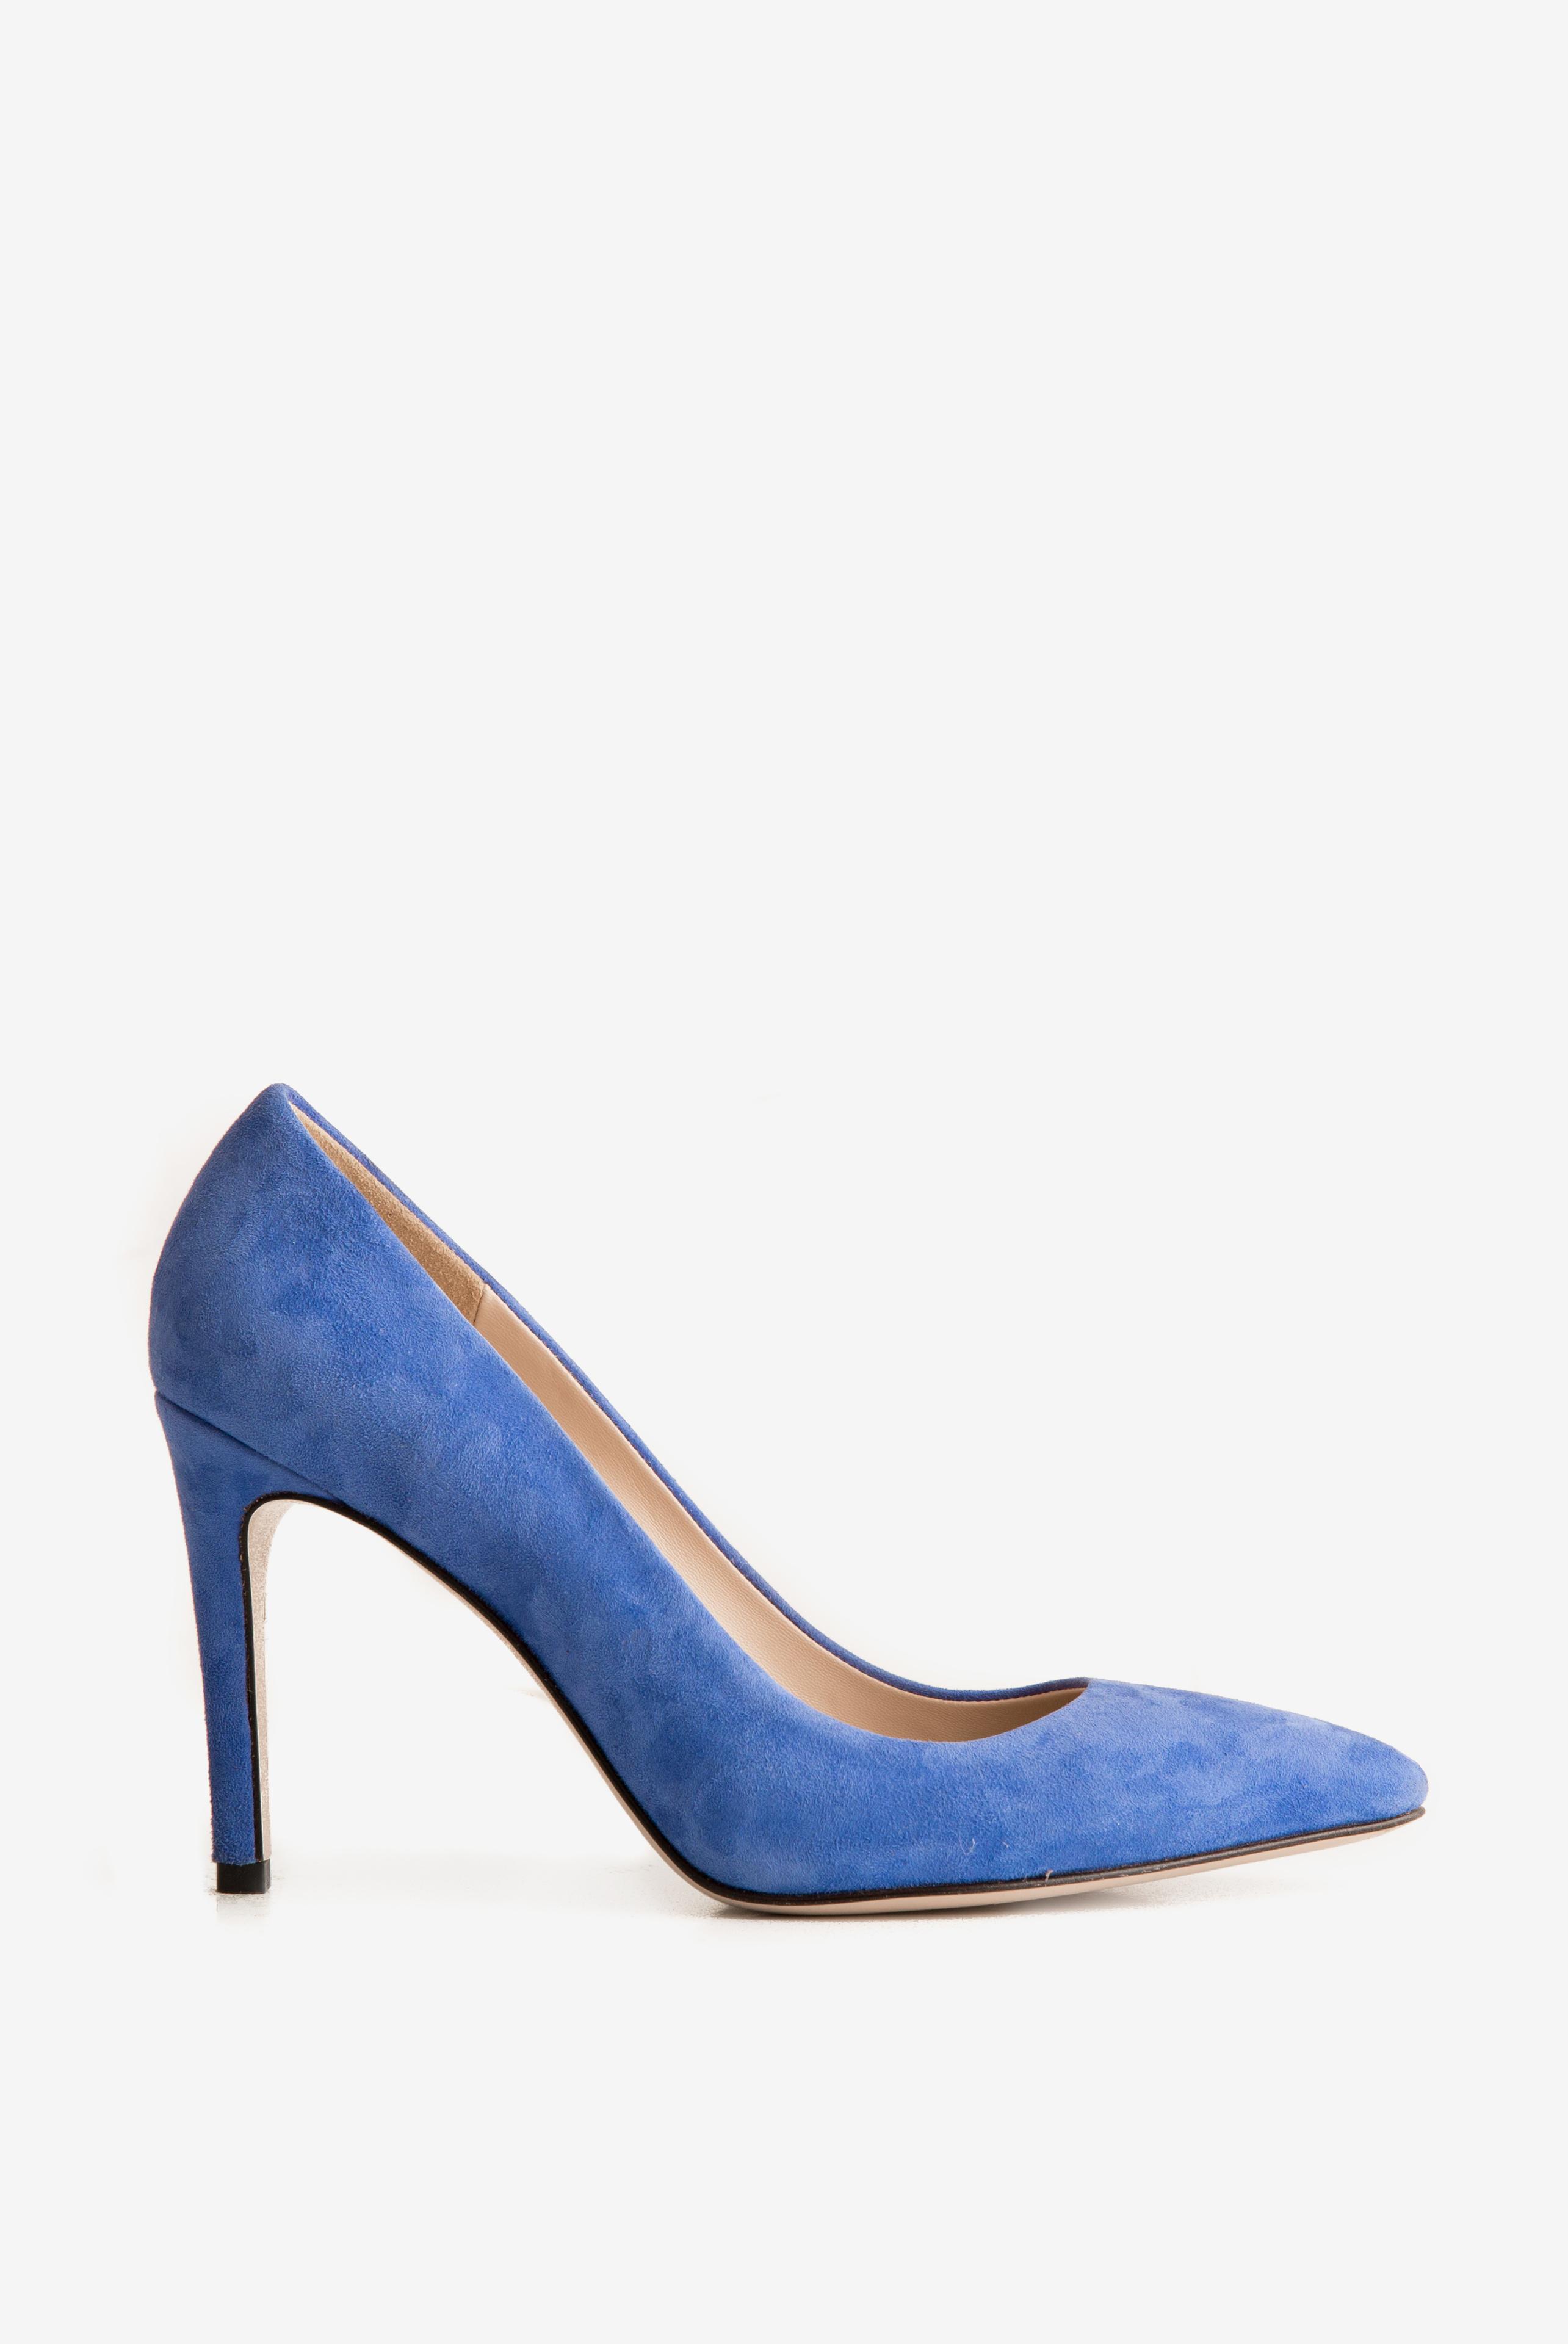 Pantofi din piele intoarsa Alice105 Ginissima imagine 0